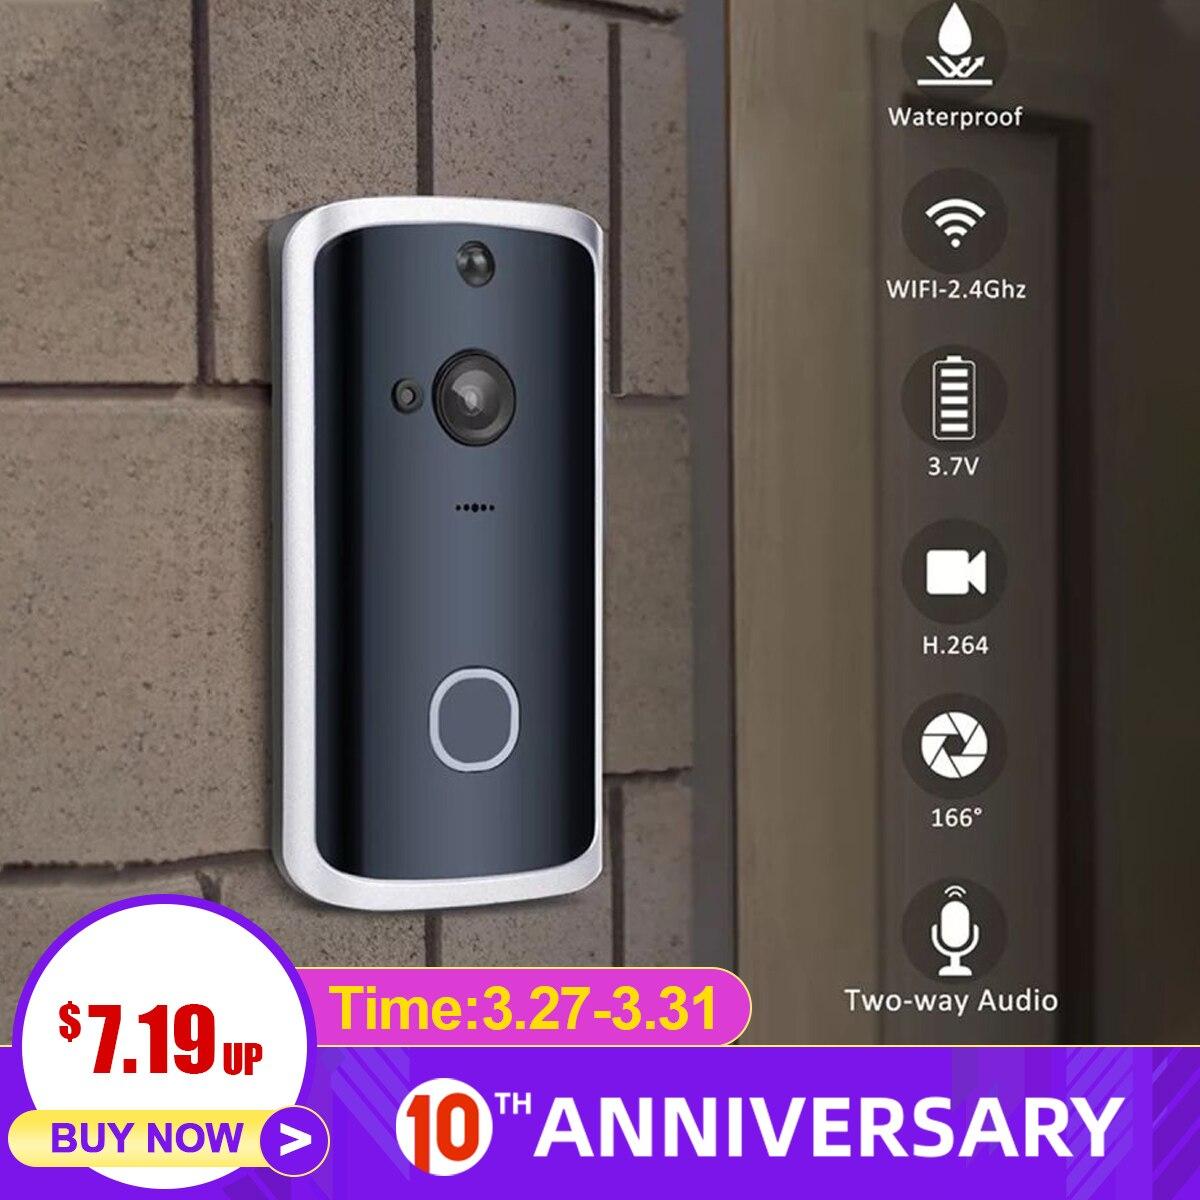 Smart WiFi Video Doorbell Camera 2Way Wireless Doorbell Intercom APP Phone Record Picture Video Home Security Ding-dong Receiver